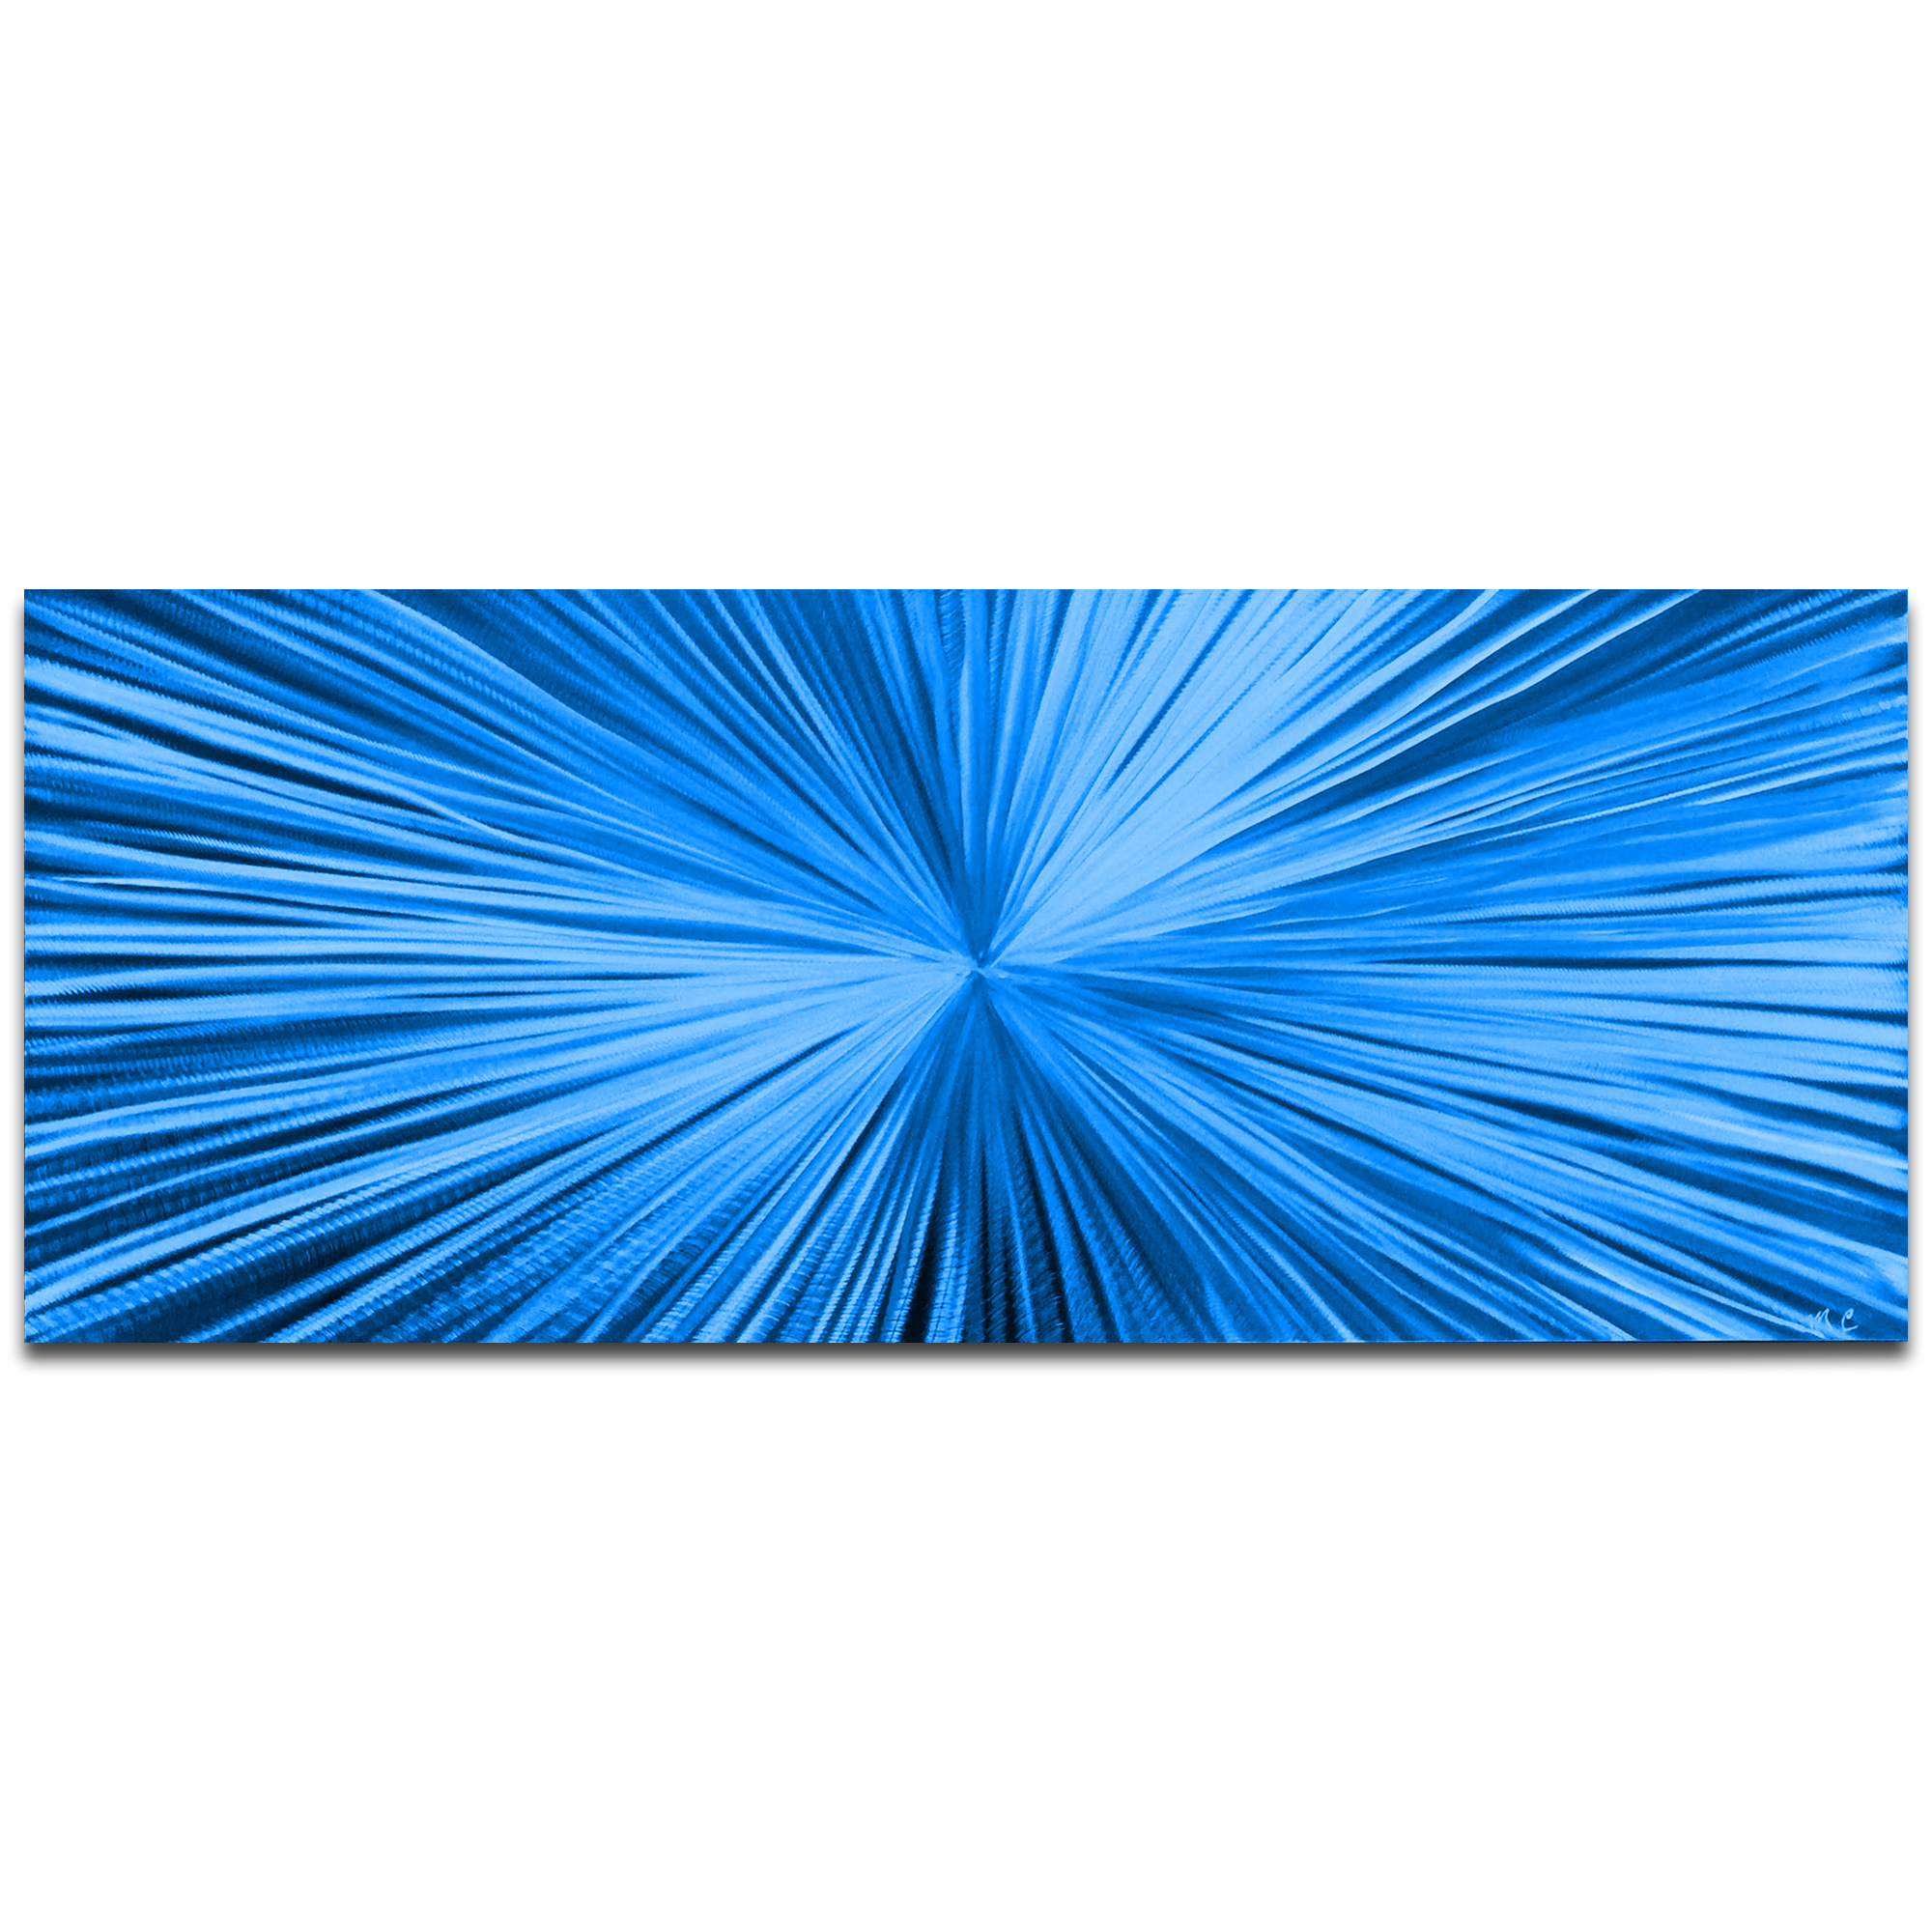 Metal Art Studio - Starburst Blue by Helena Martin - Original ...